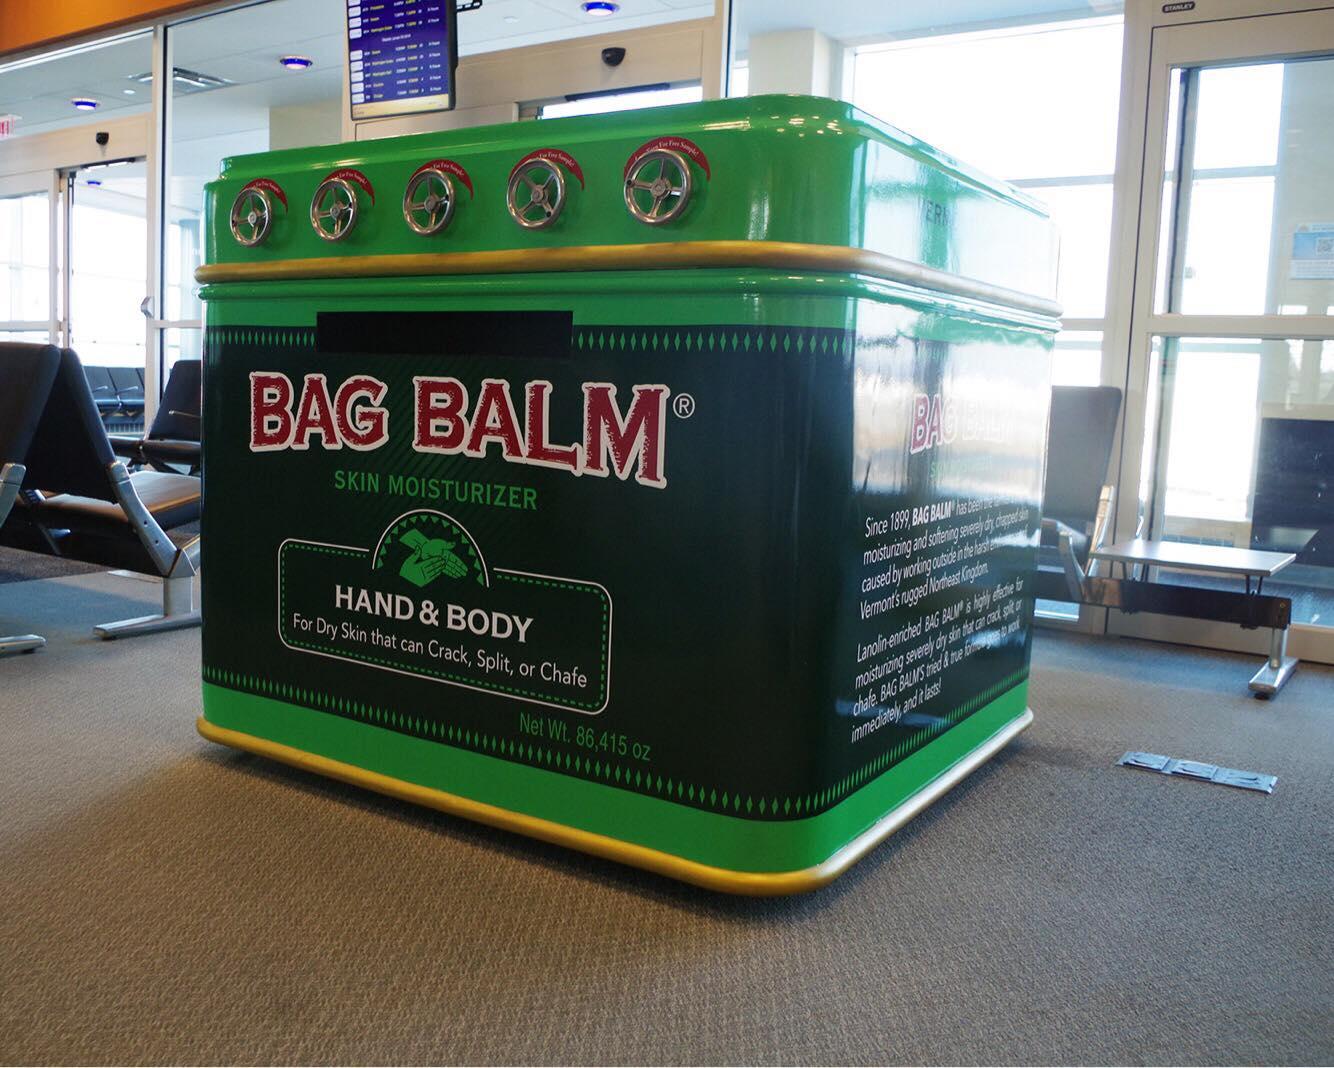 Bag Balm Vending Machine